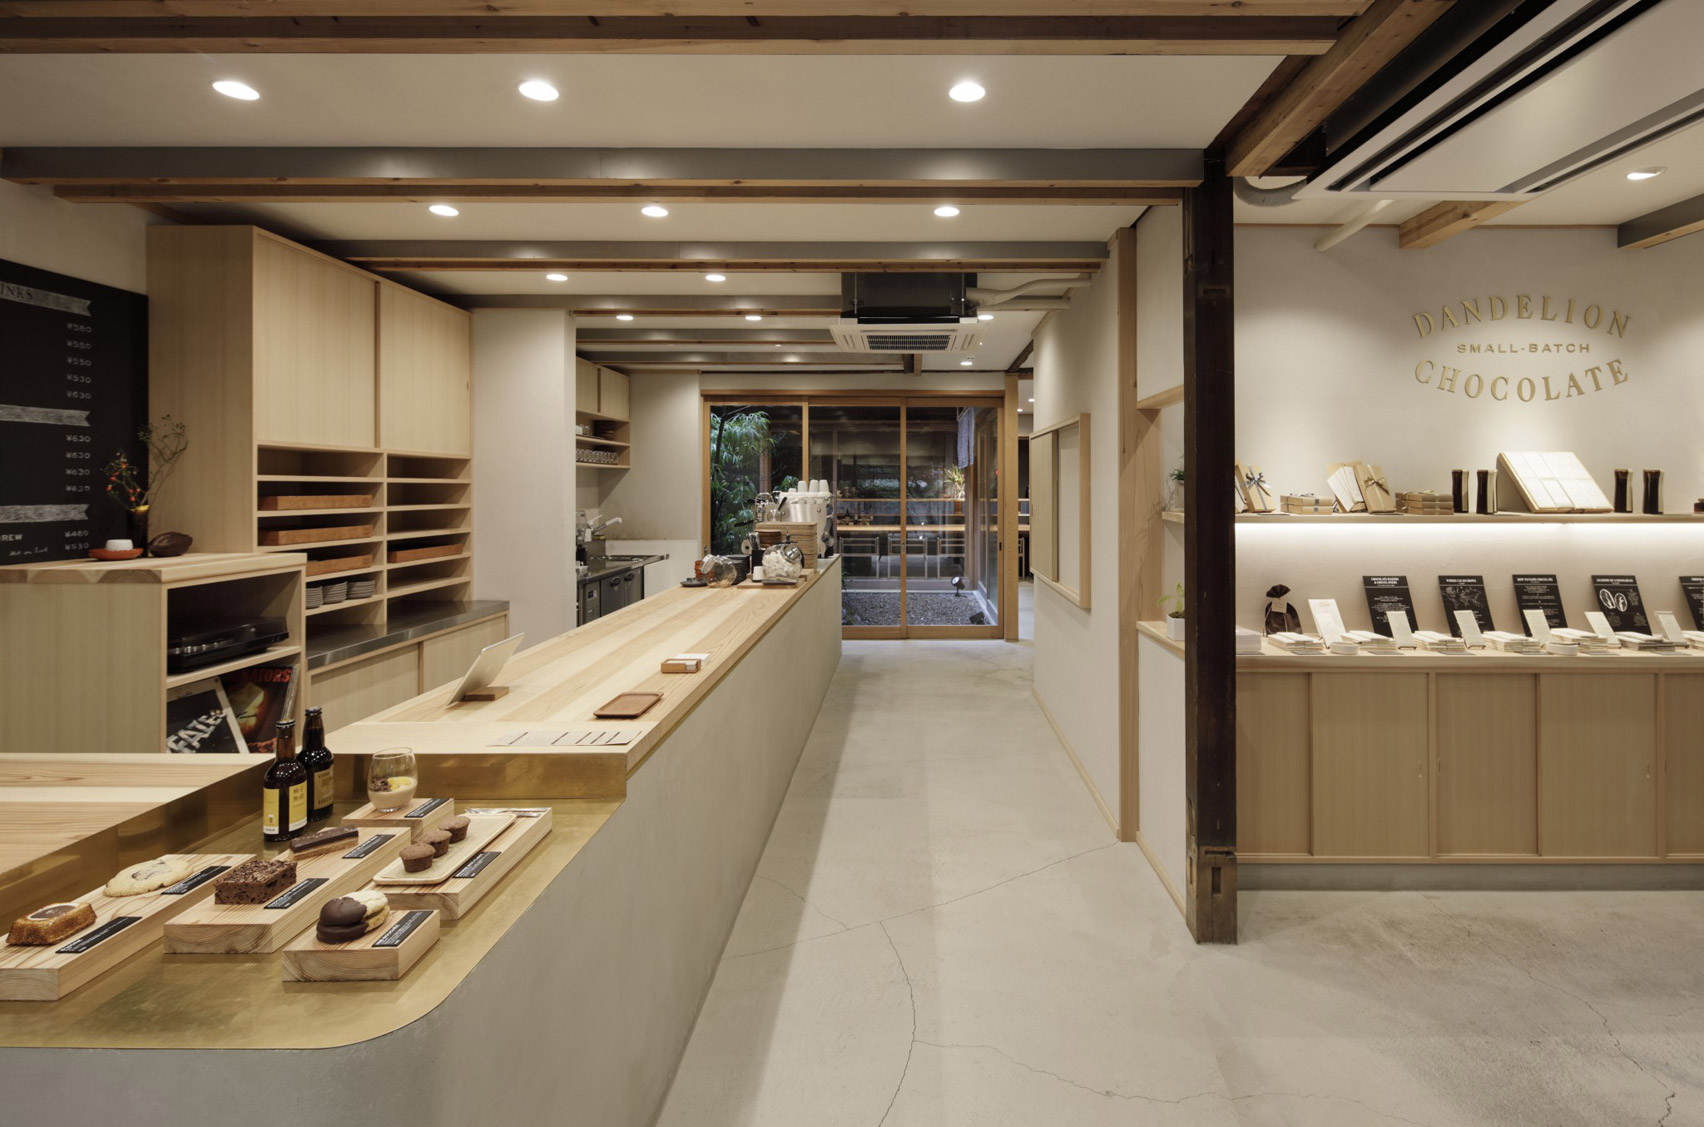 Dandelion Chocolate, Kyoto, designed by Fumihiko Sano Studio